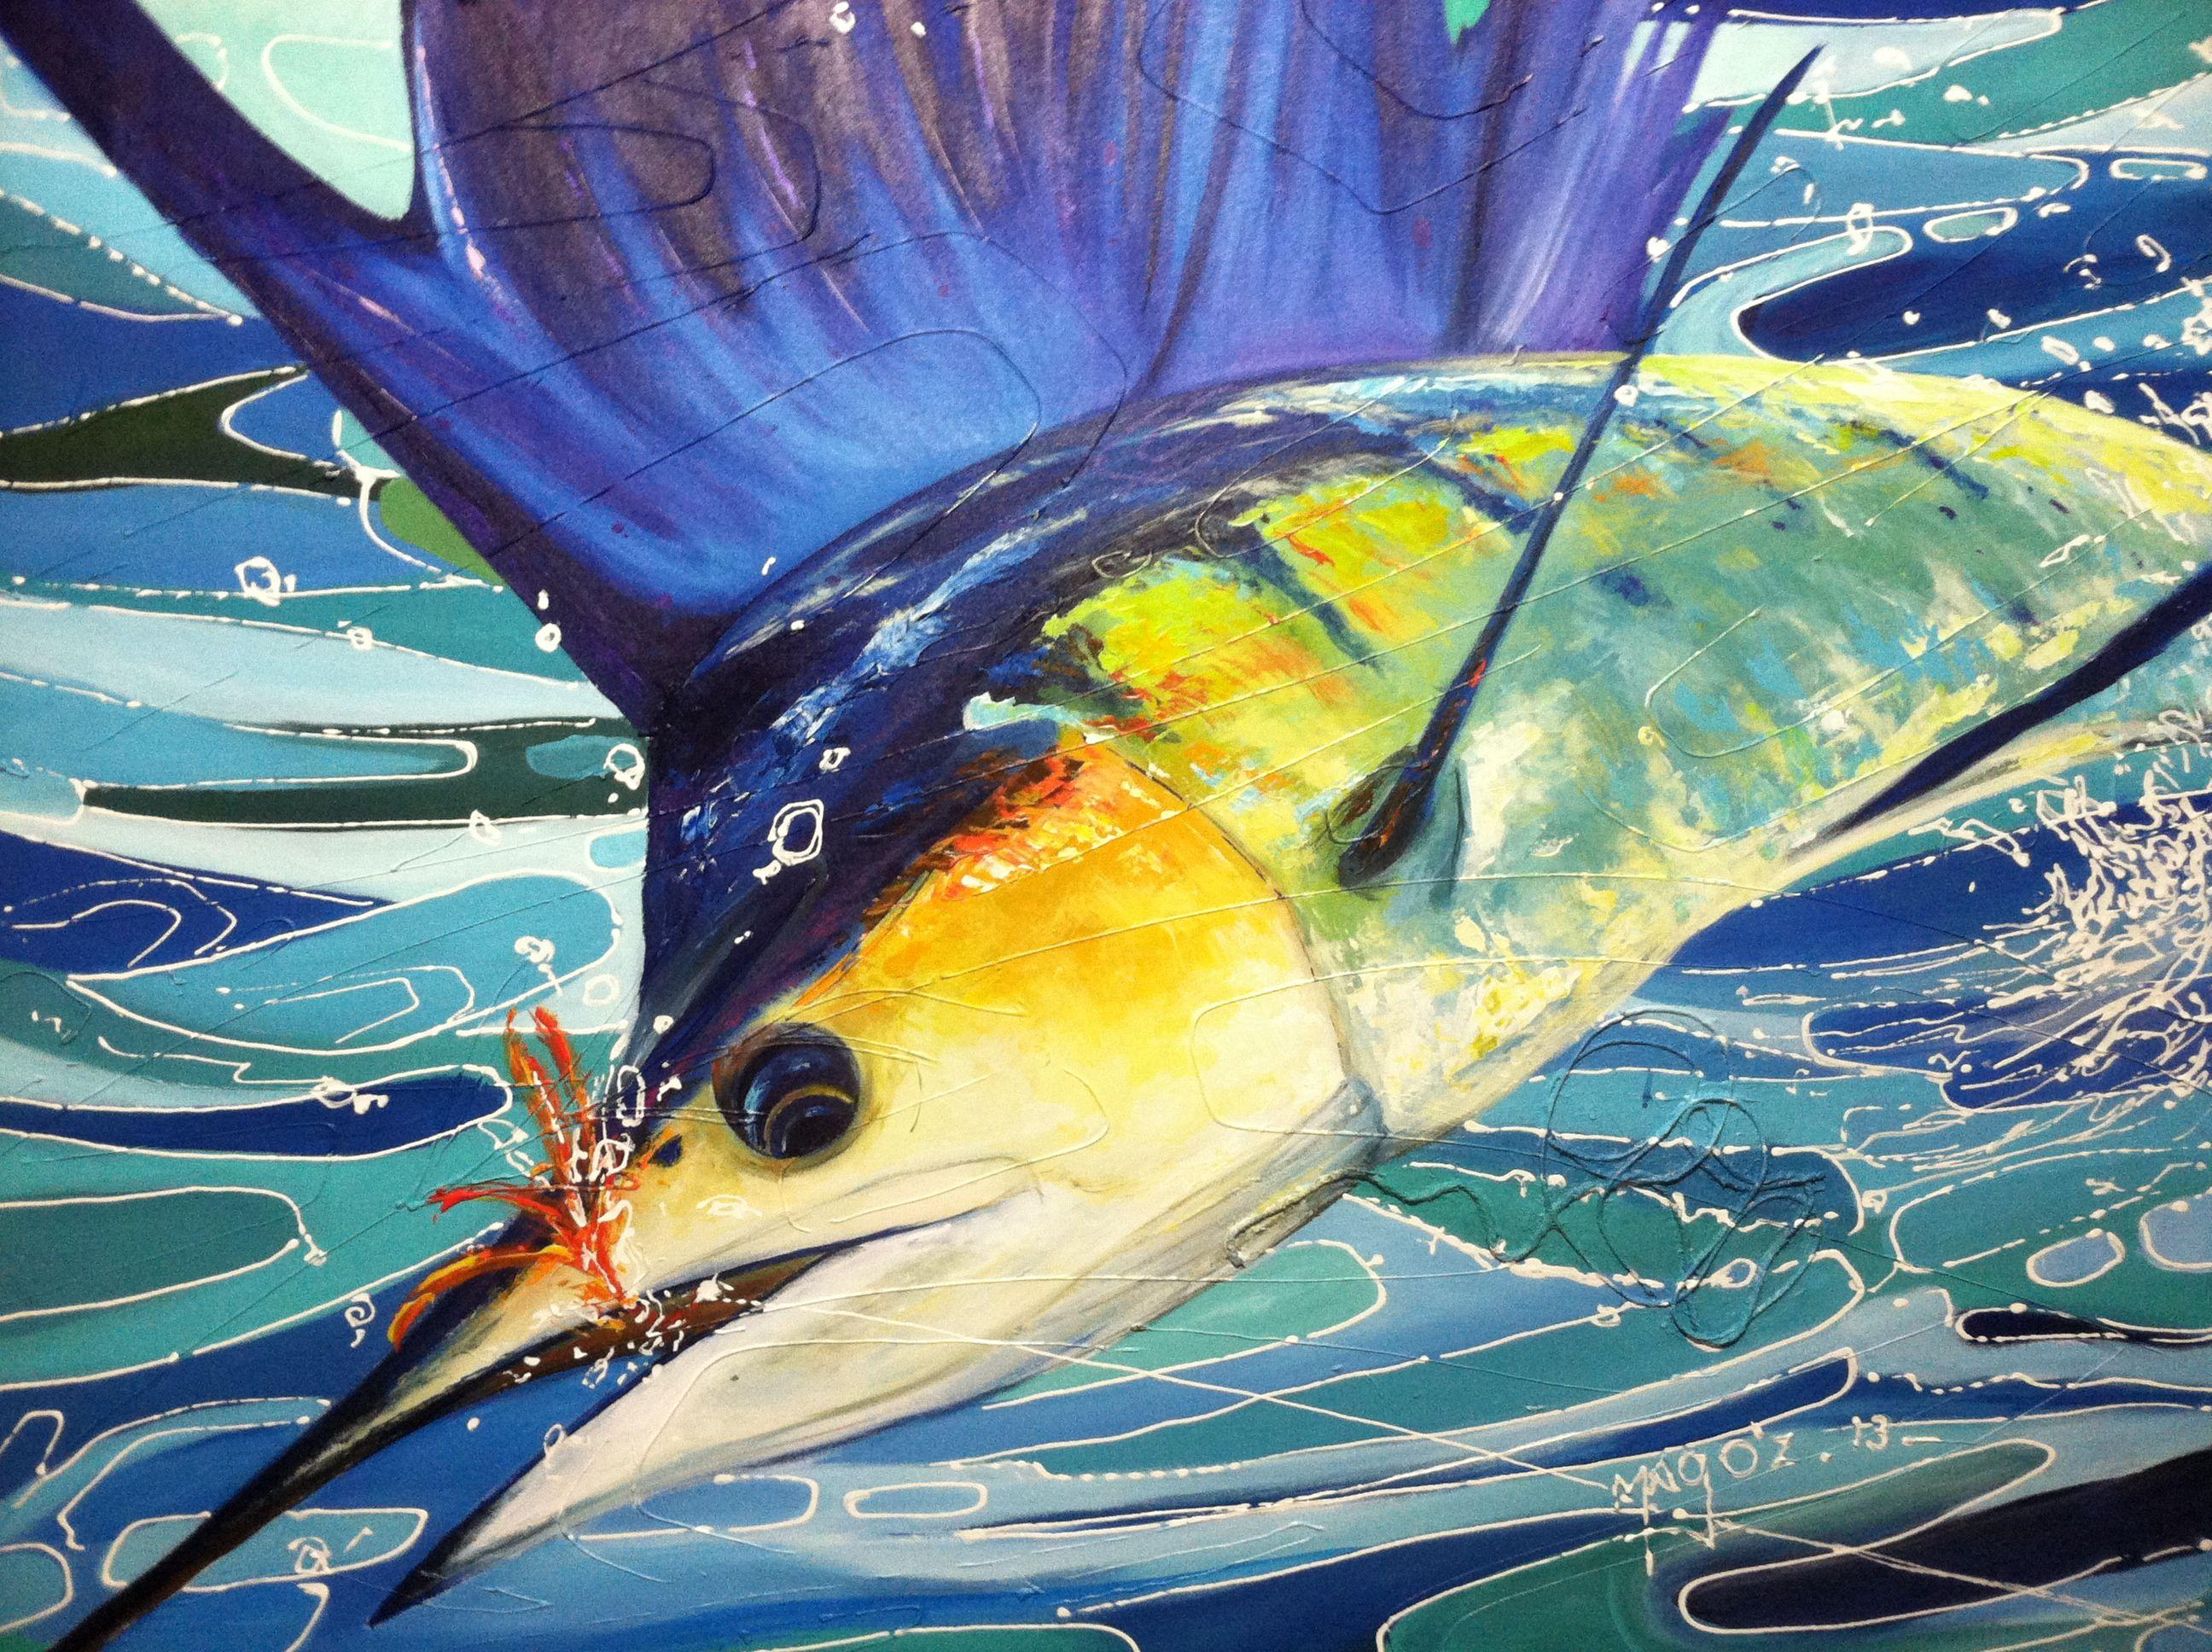 Sailfish by Mago\'z | Animal Nature | Pinterest | Beautiful things ...